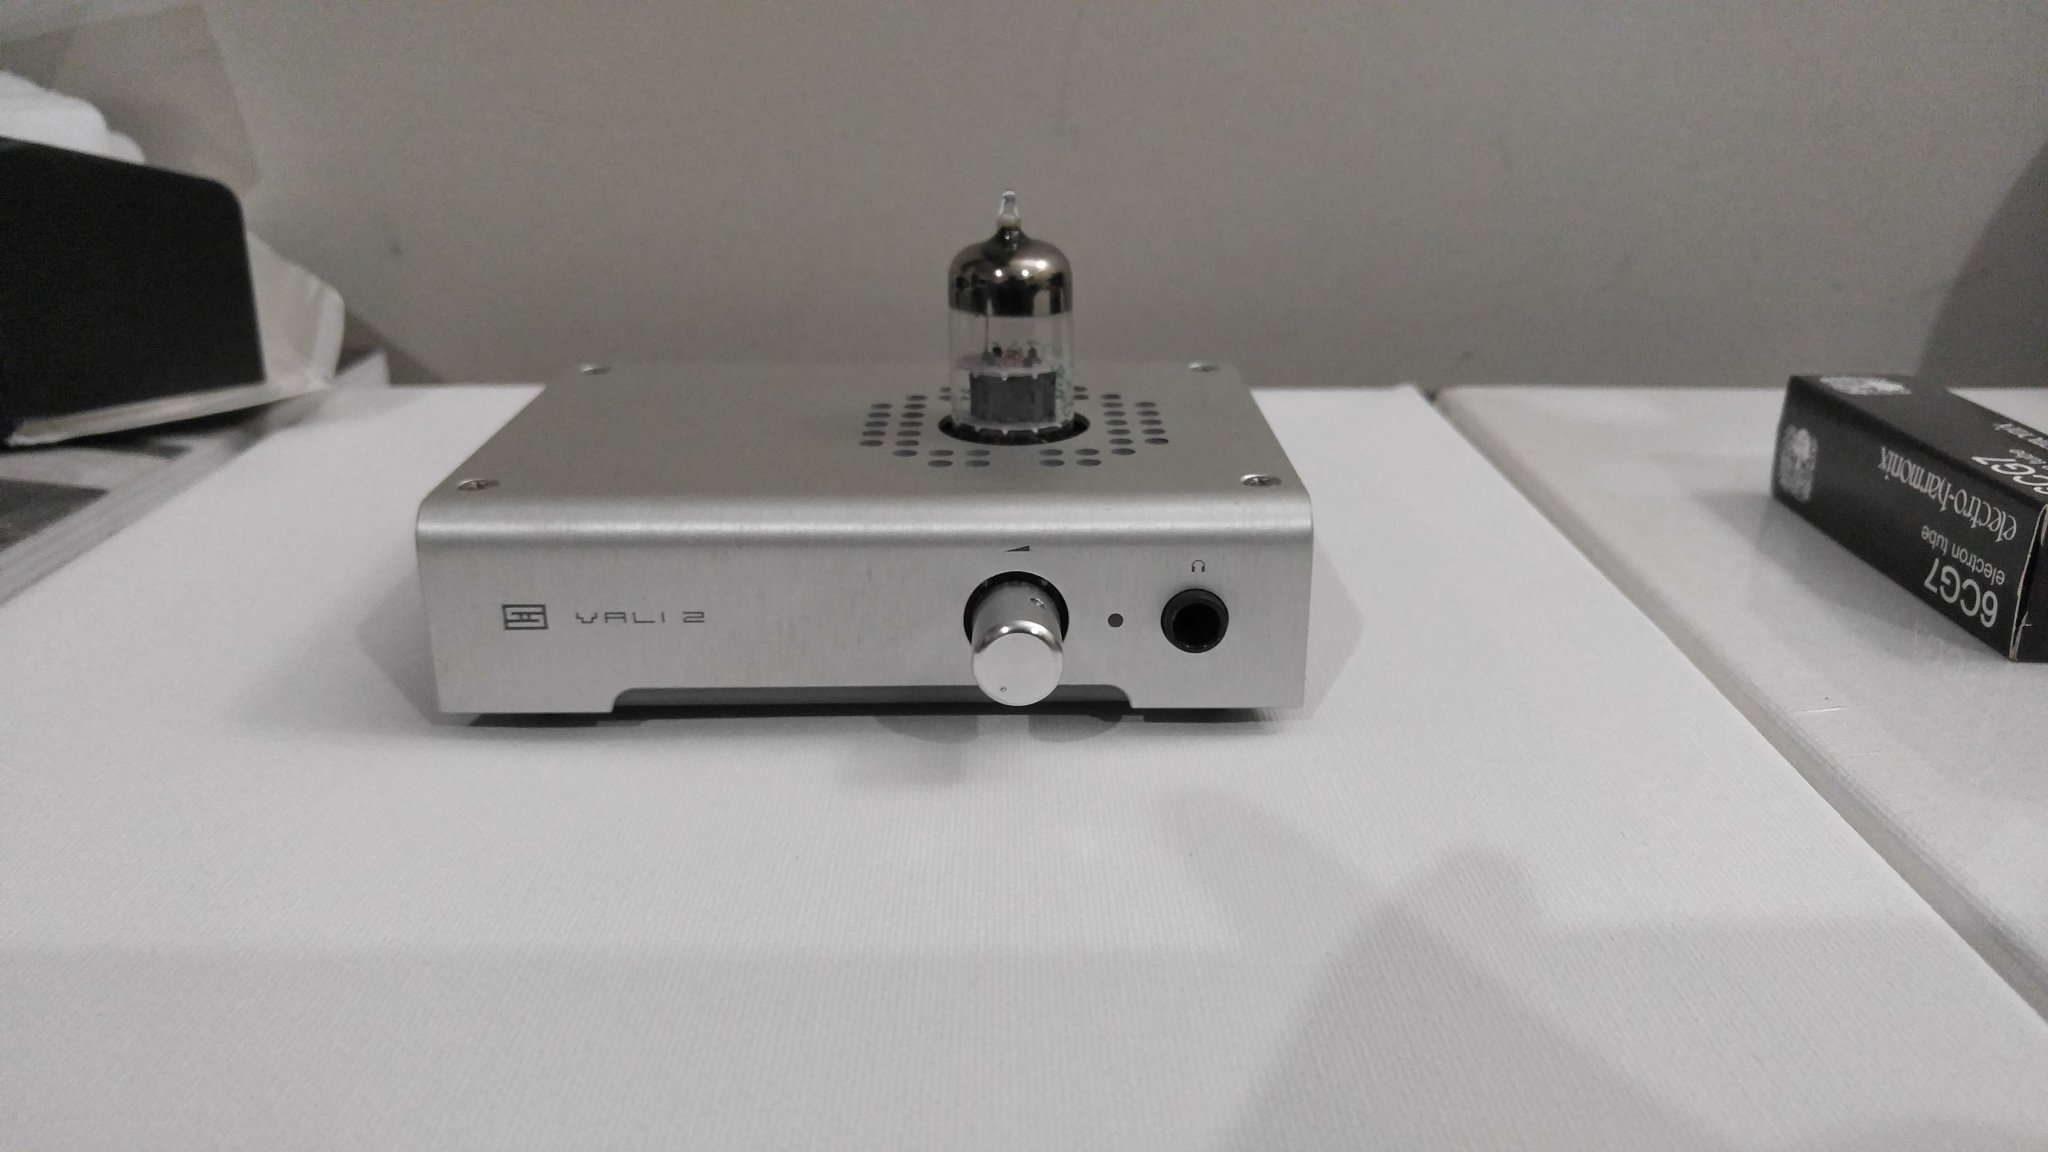 SOLD]WTS: Schiit Vali 2 + Tubes $130   Super Best Audio Friends